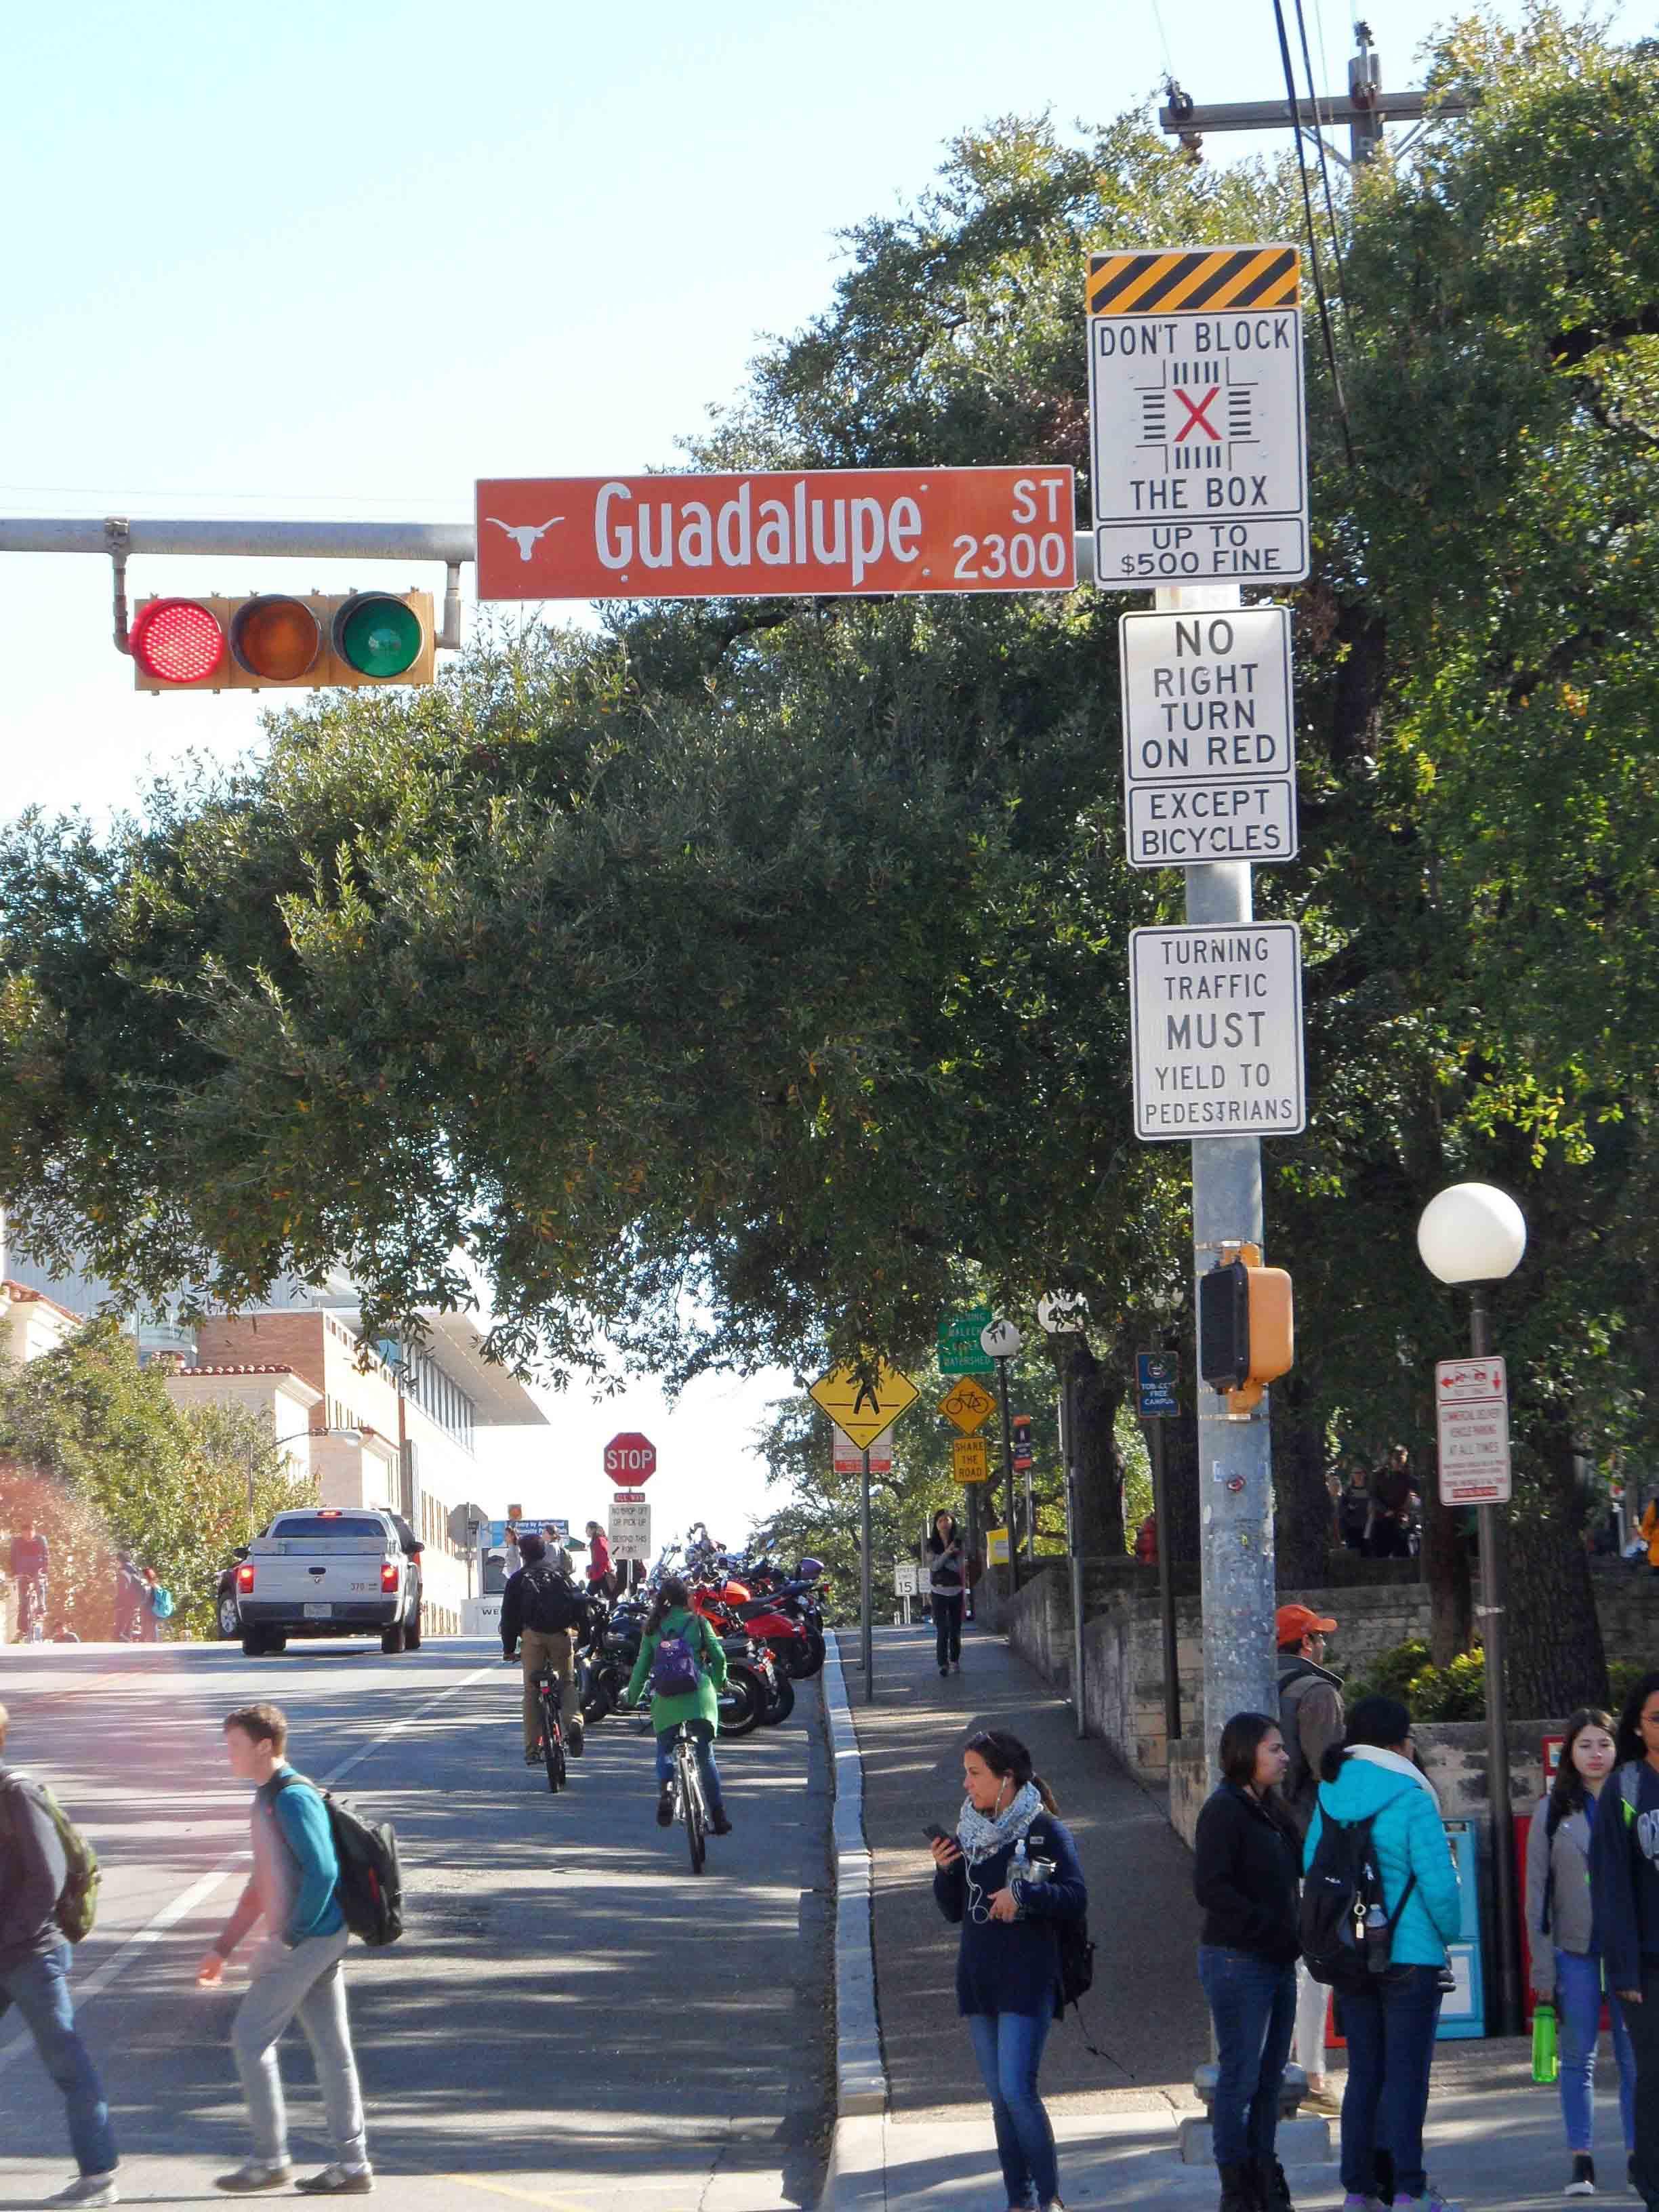 Guadeloupe Street, Austin/Texas